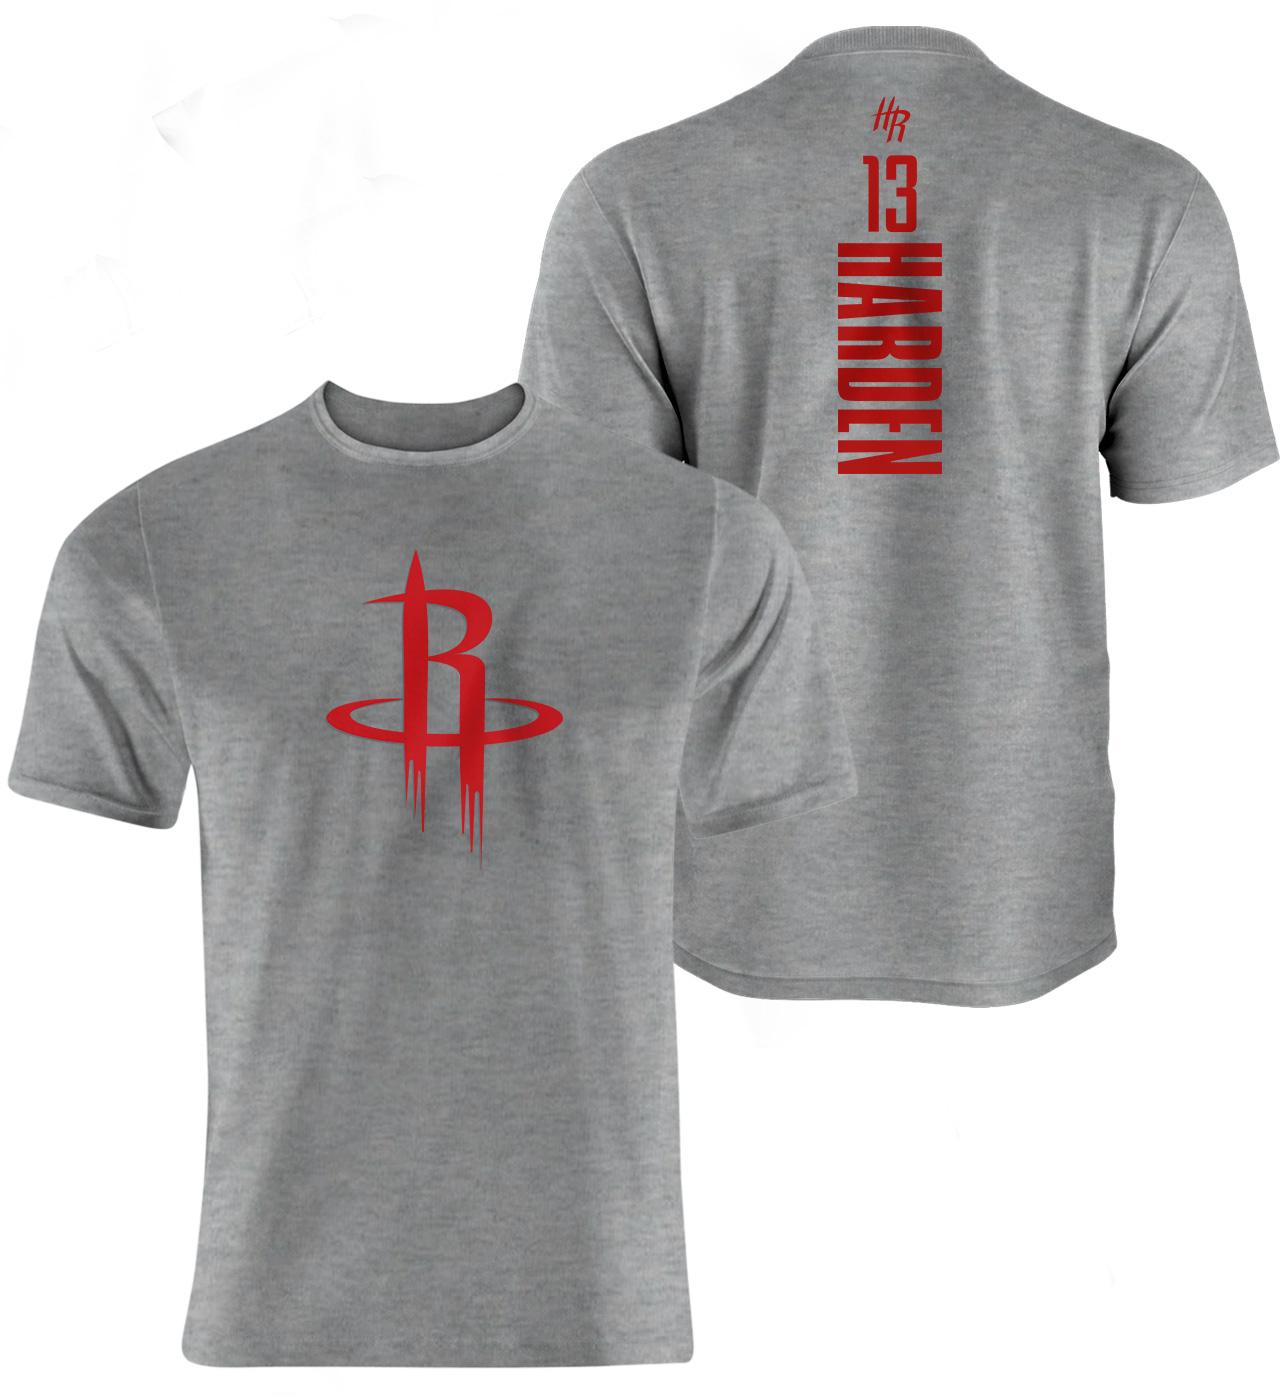 James Harden Vertical Tshirt (TSH-GRY-NP-111-PLYR-HOU-HARDEN.VER.)